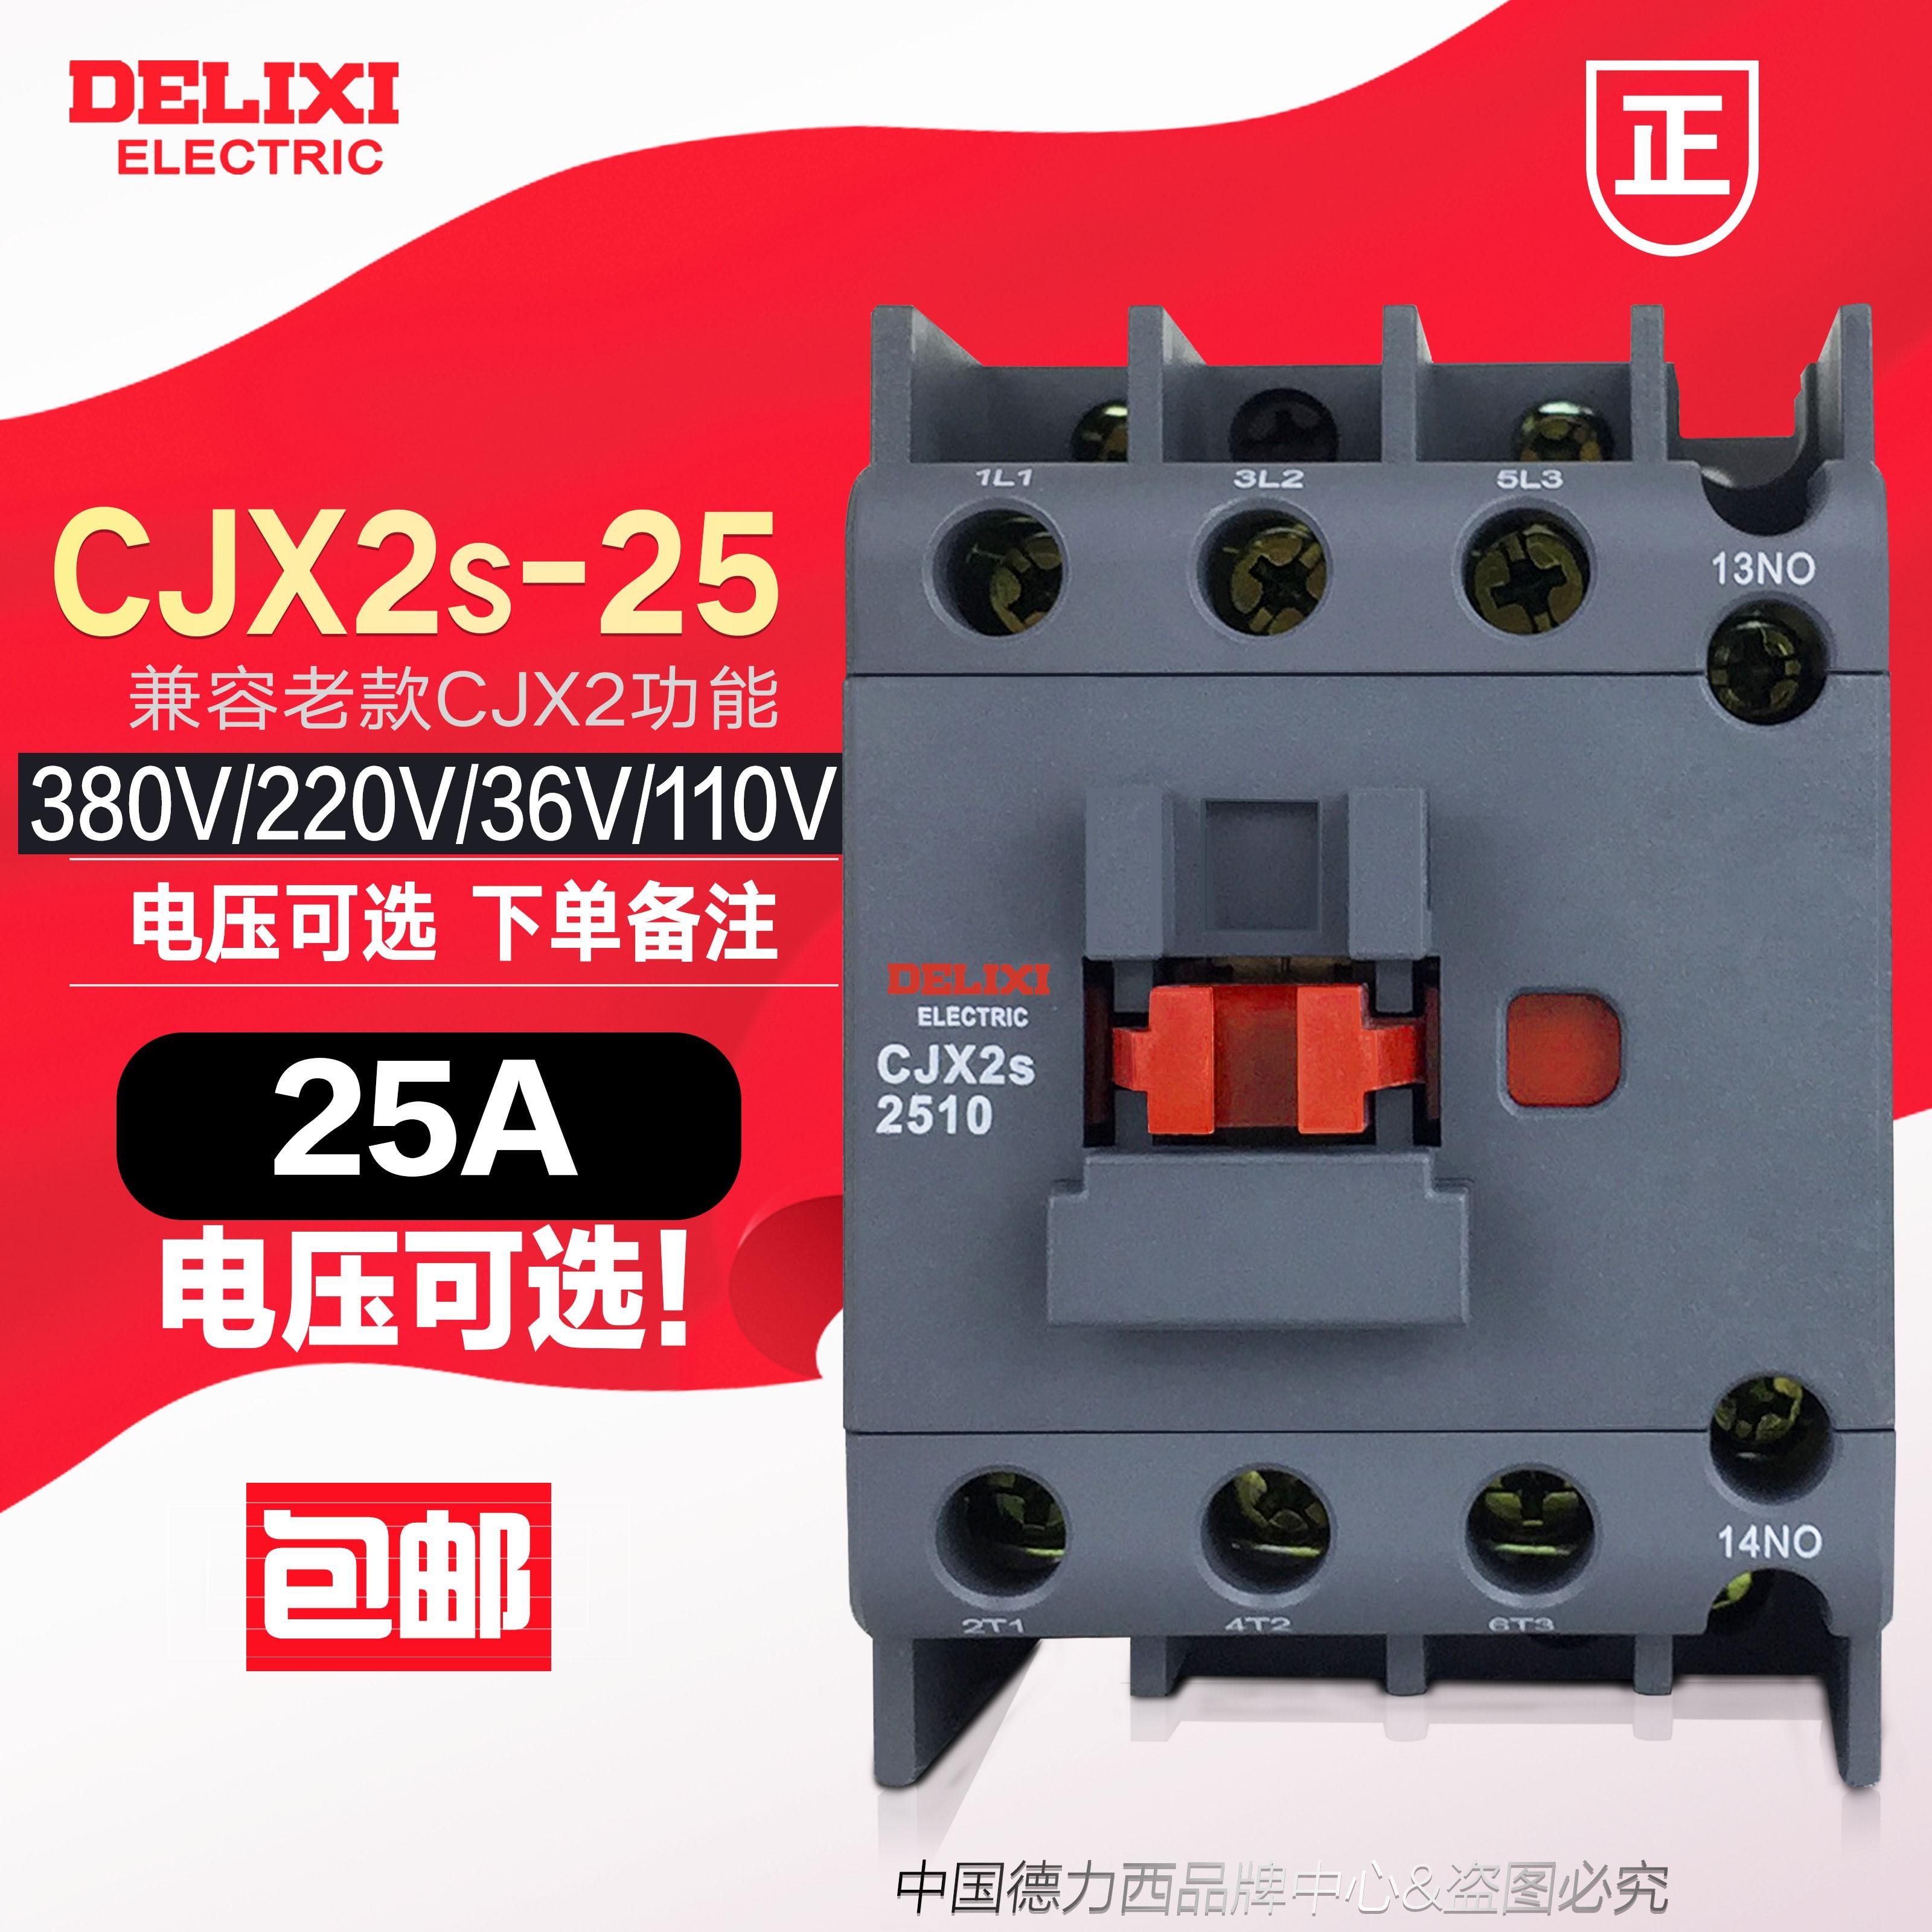 德力西交流接触器25A CJX2s-2510 2501 36V 110V 220V 380V